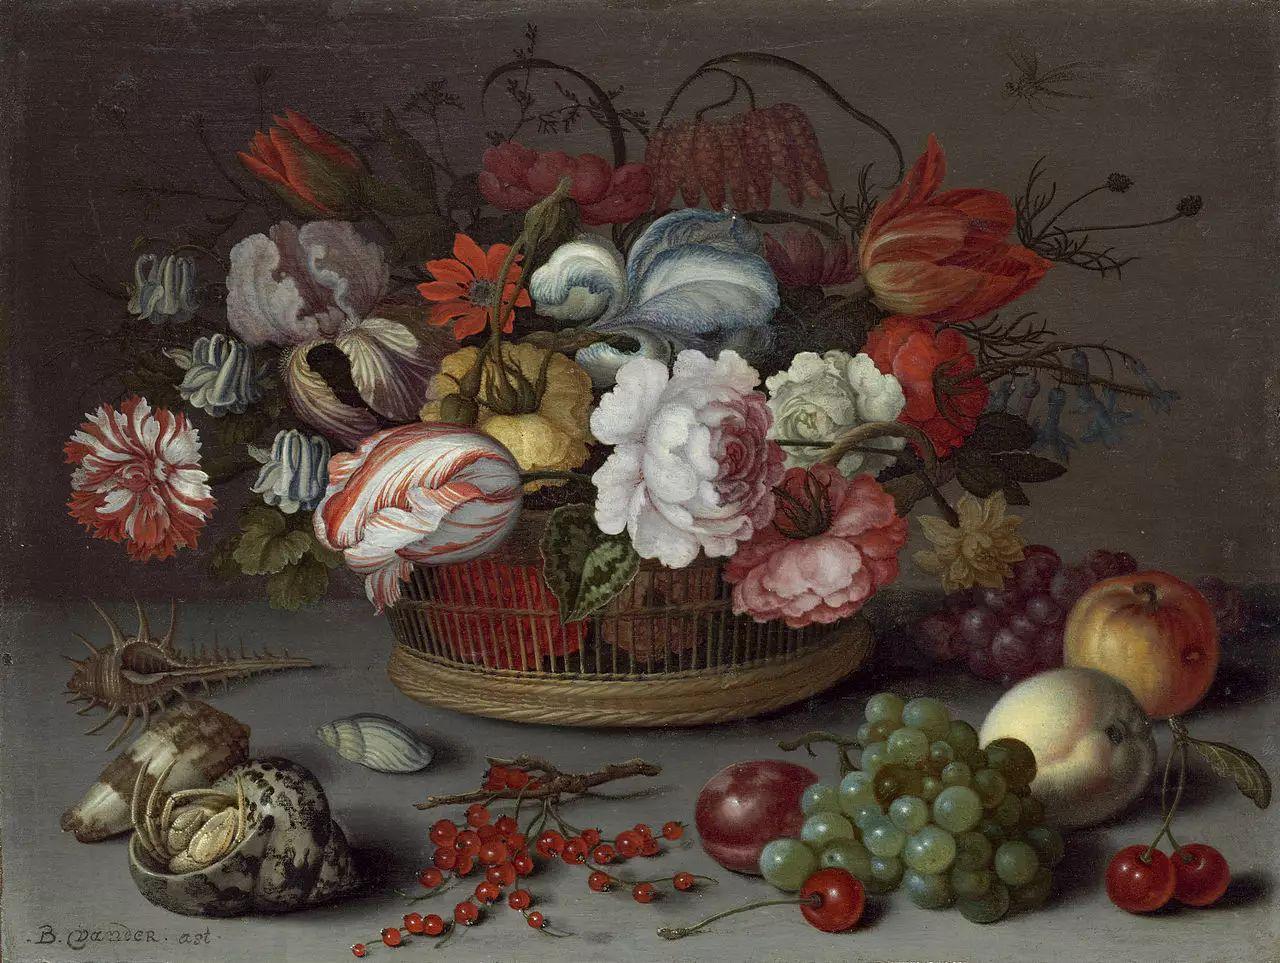 花卉静物 荷兰画家Balthasar van der Ast作品插图103